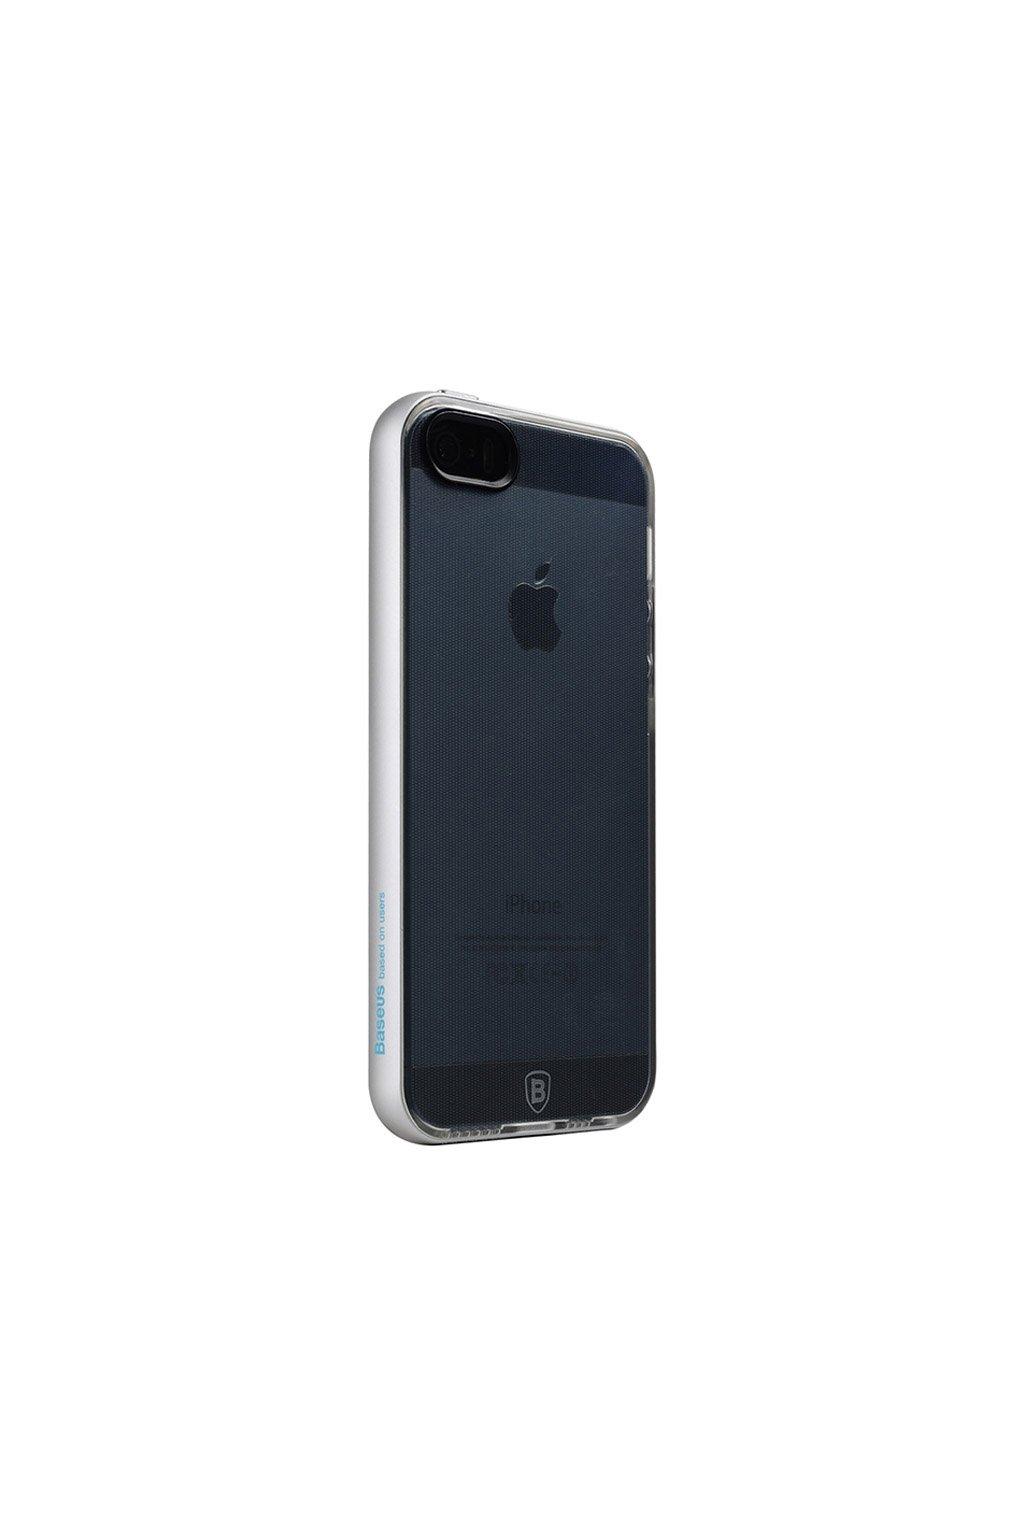 Pouzdro s kovovým rámem Baseus Apple iPhone 5/5S a SE, Silver